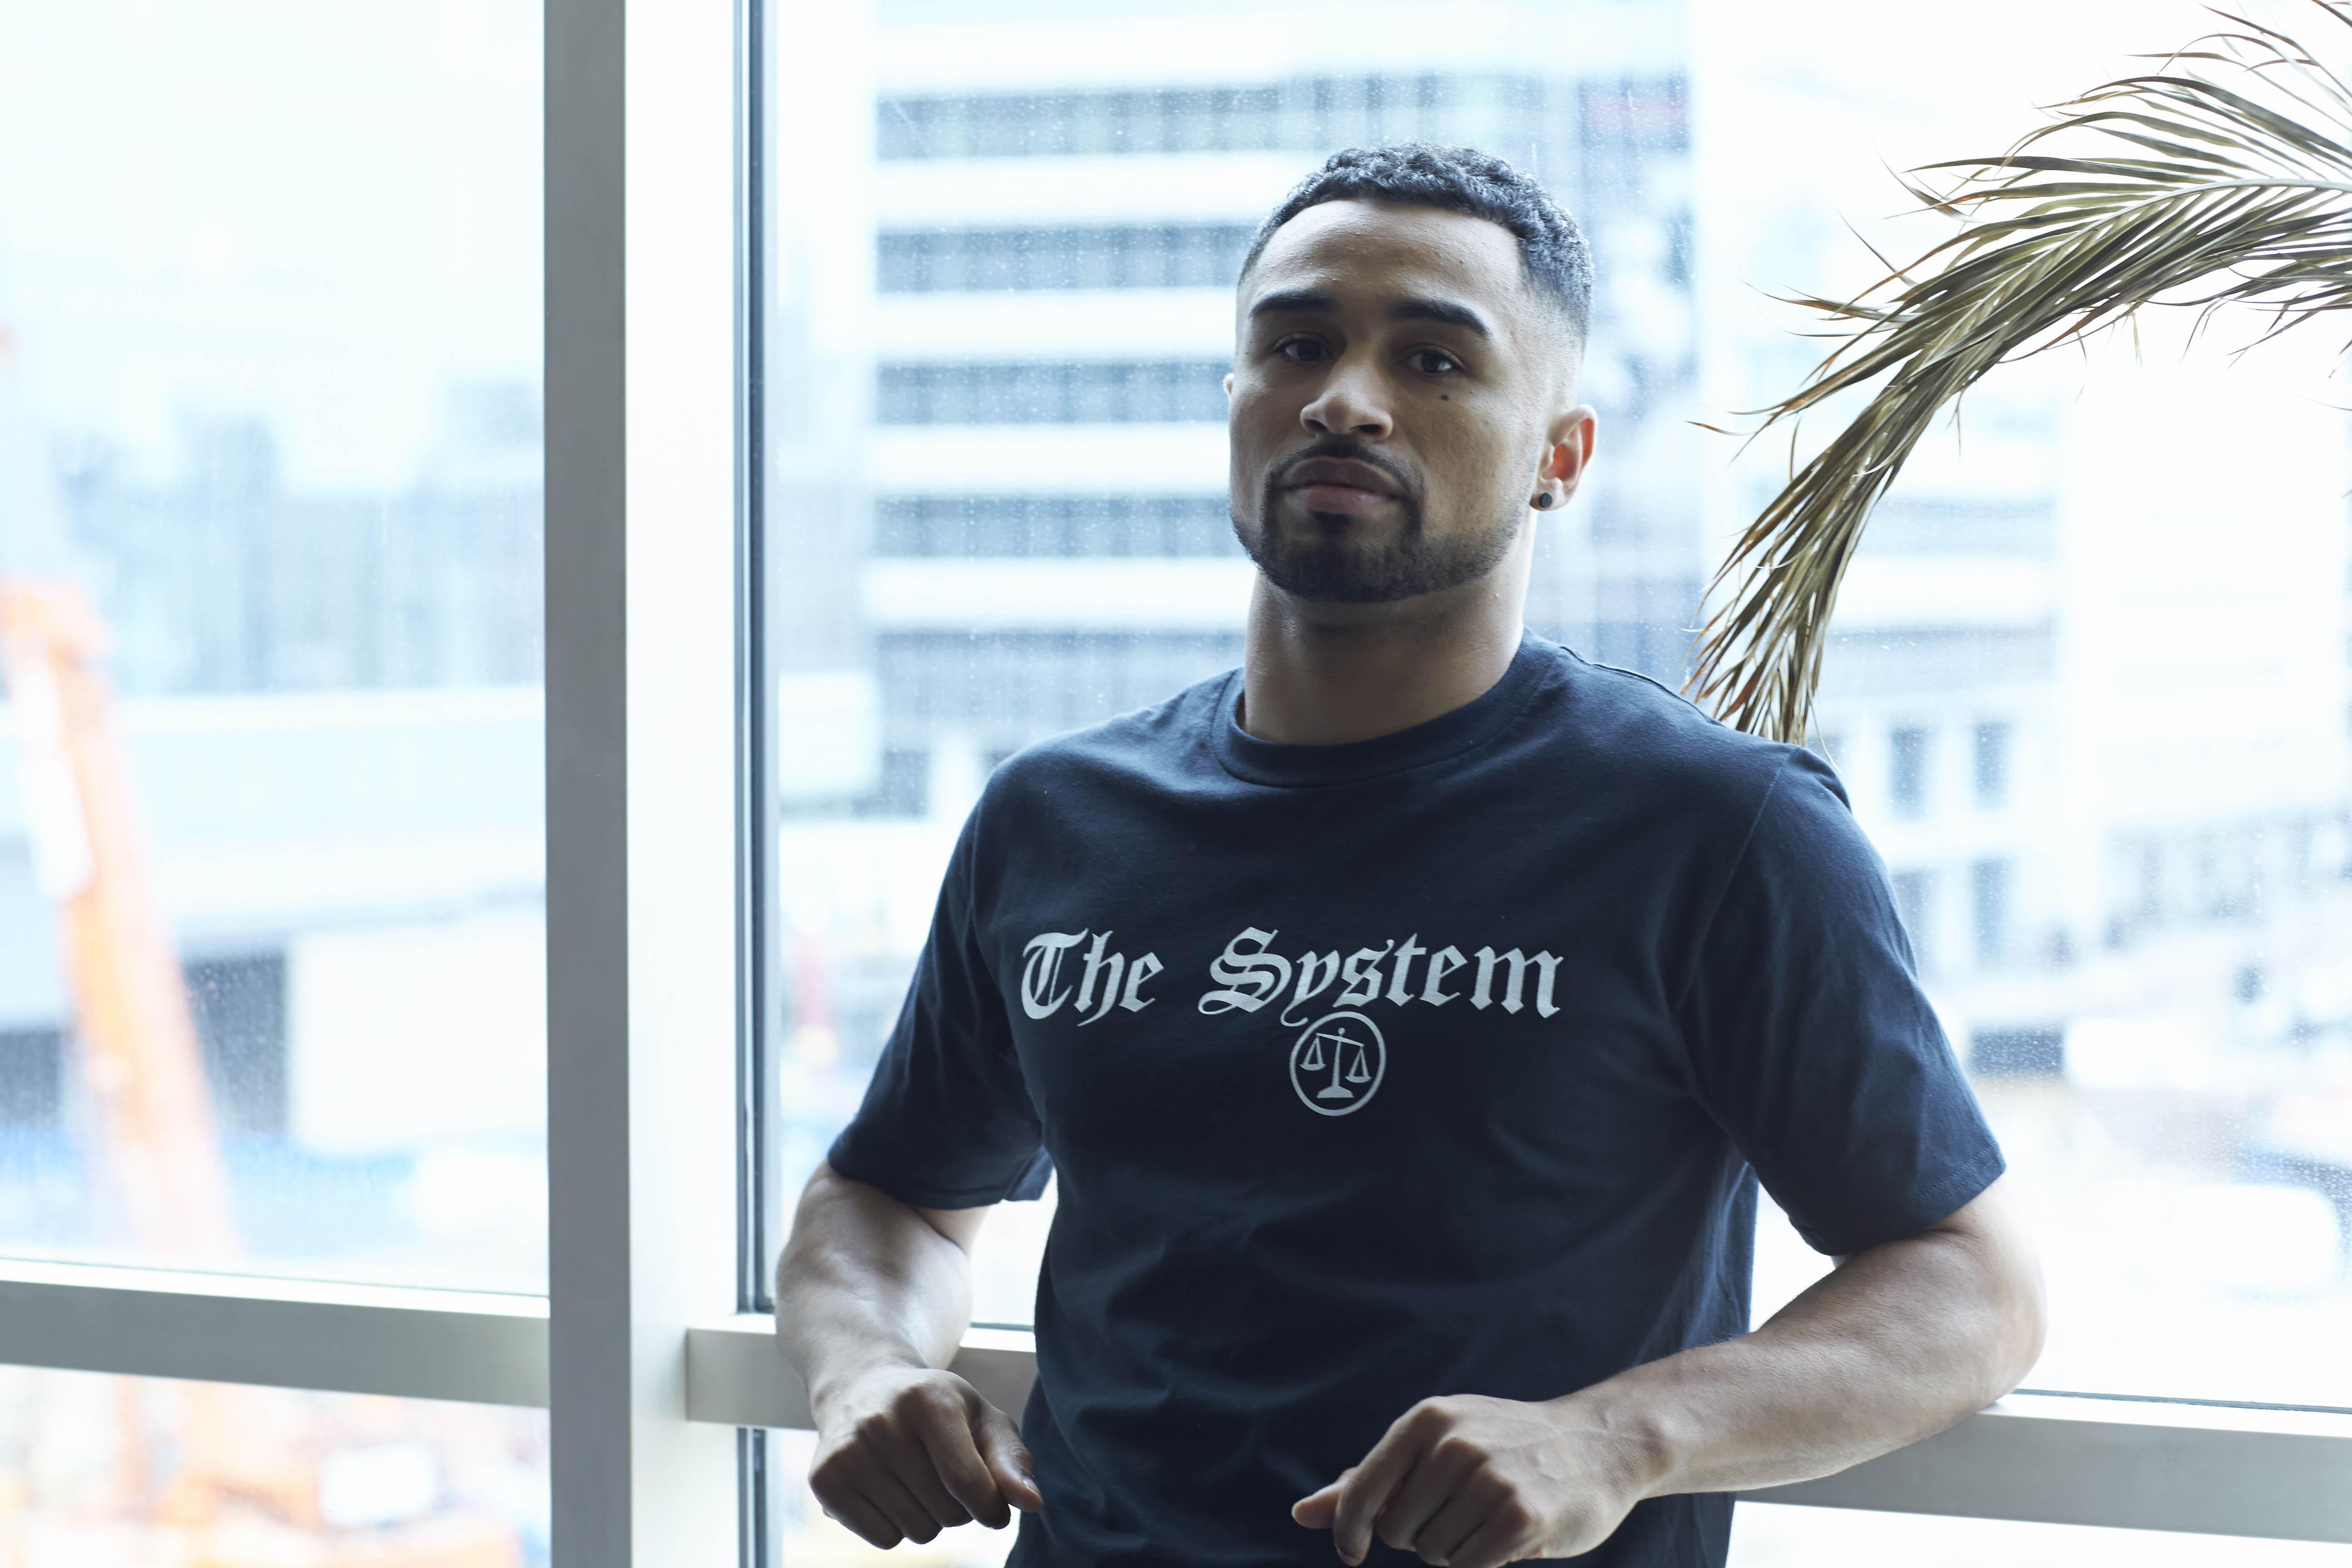 4BYSIX_The_System_Black_Shirt_alex_dawber